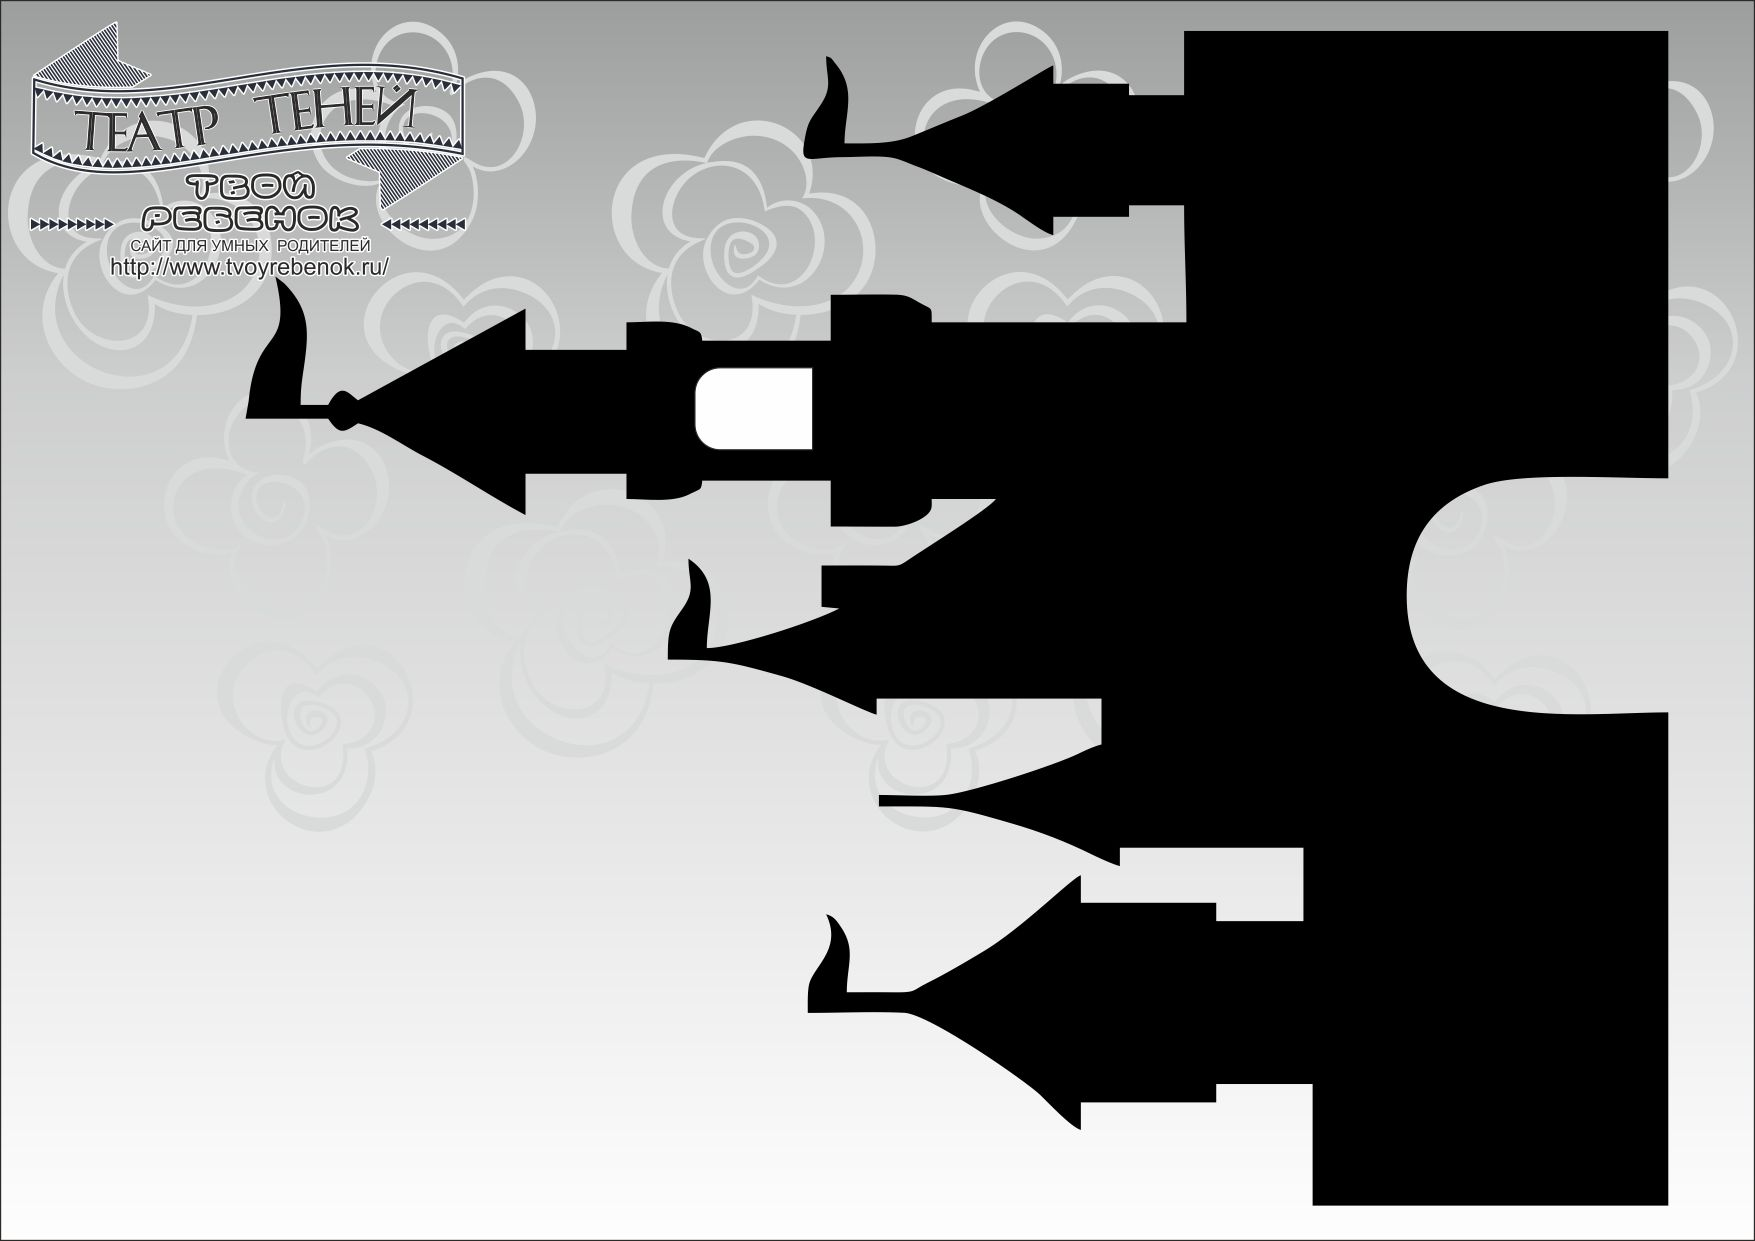 Шаблоны для теневого театра своими руками - KarLiam 12